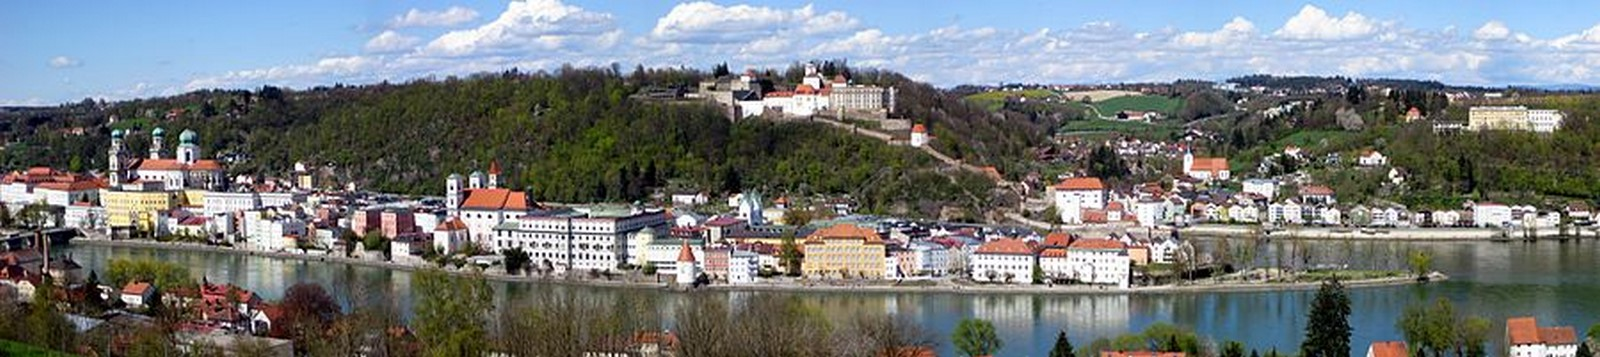 Passau and the Danube - Sheet2